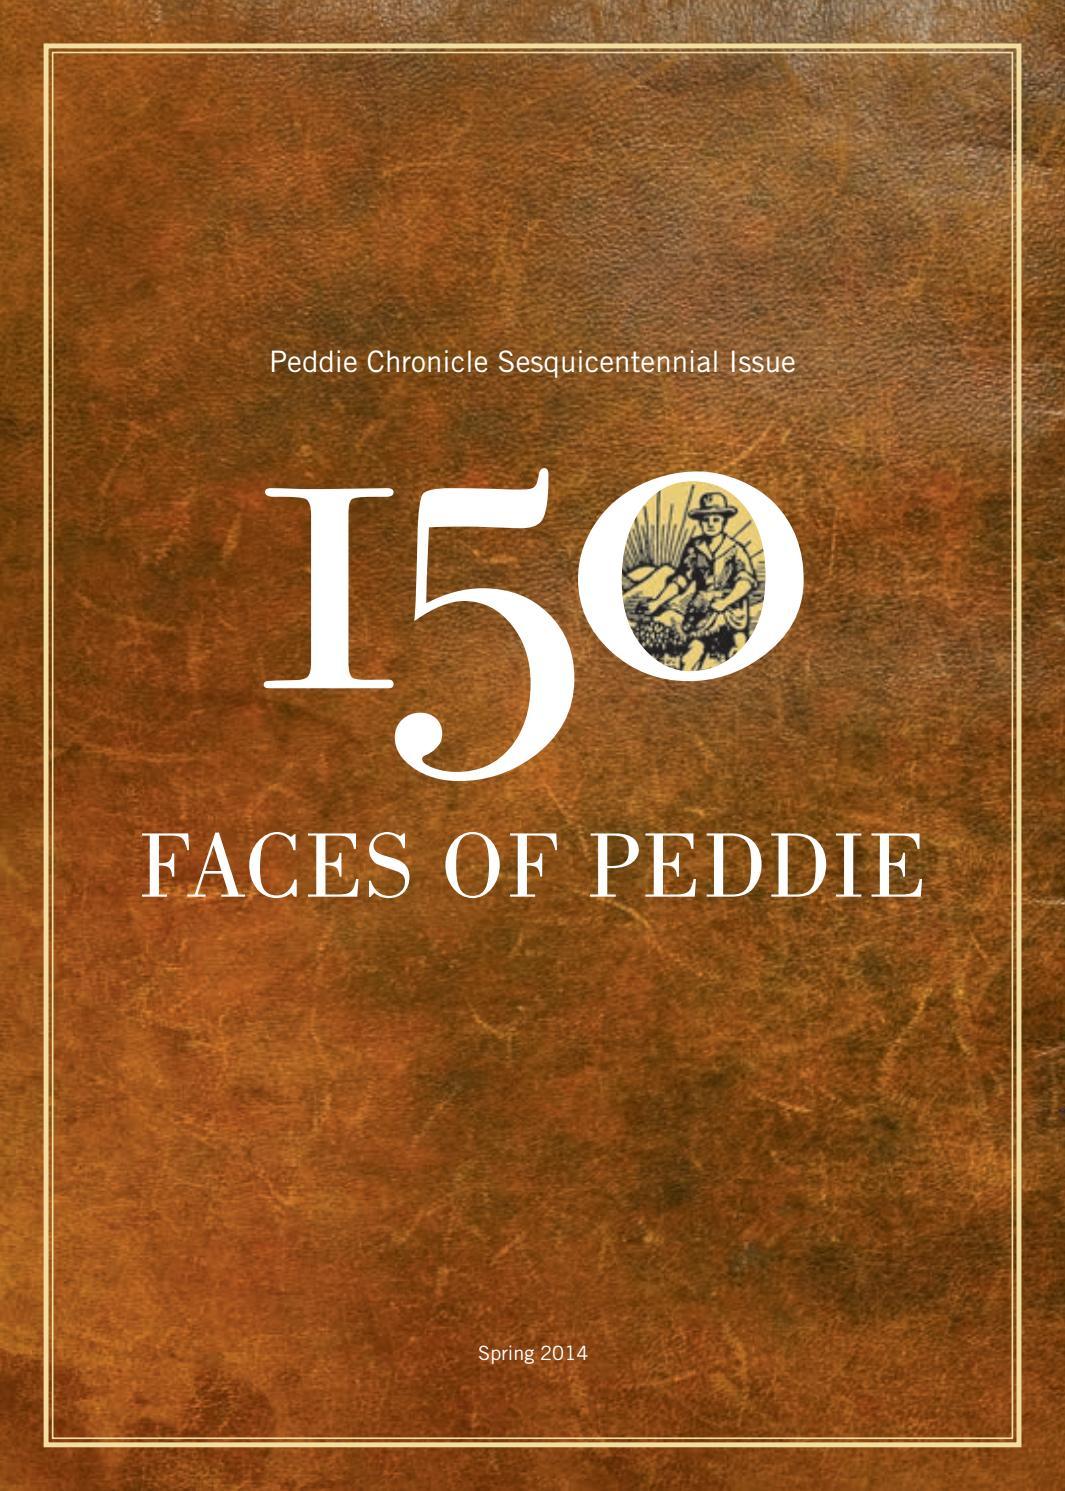 150 Faces of Peddie by Peddie School - issuu